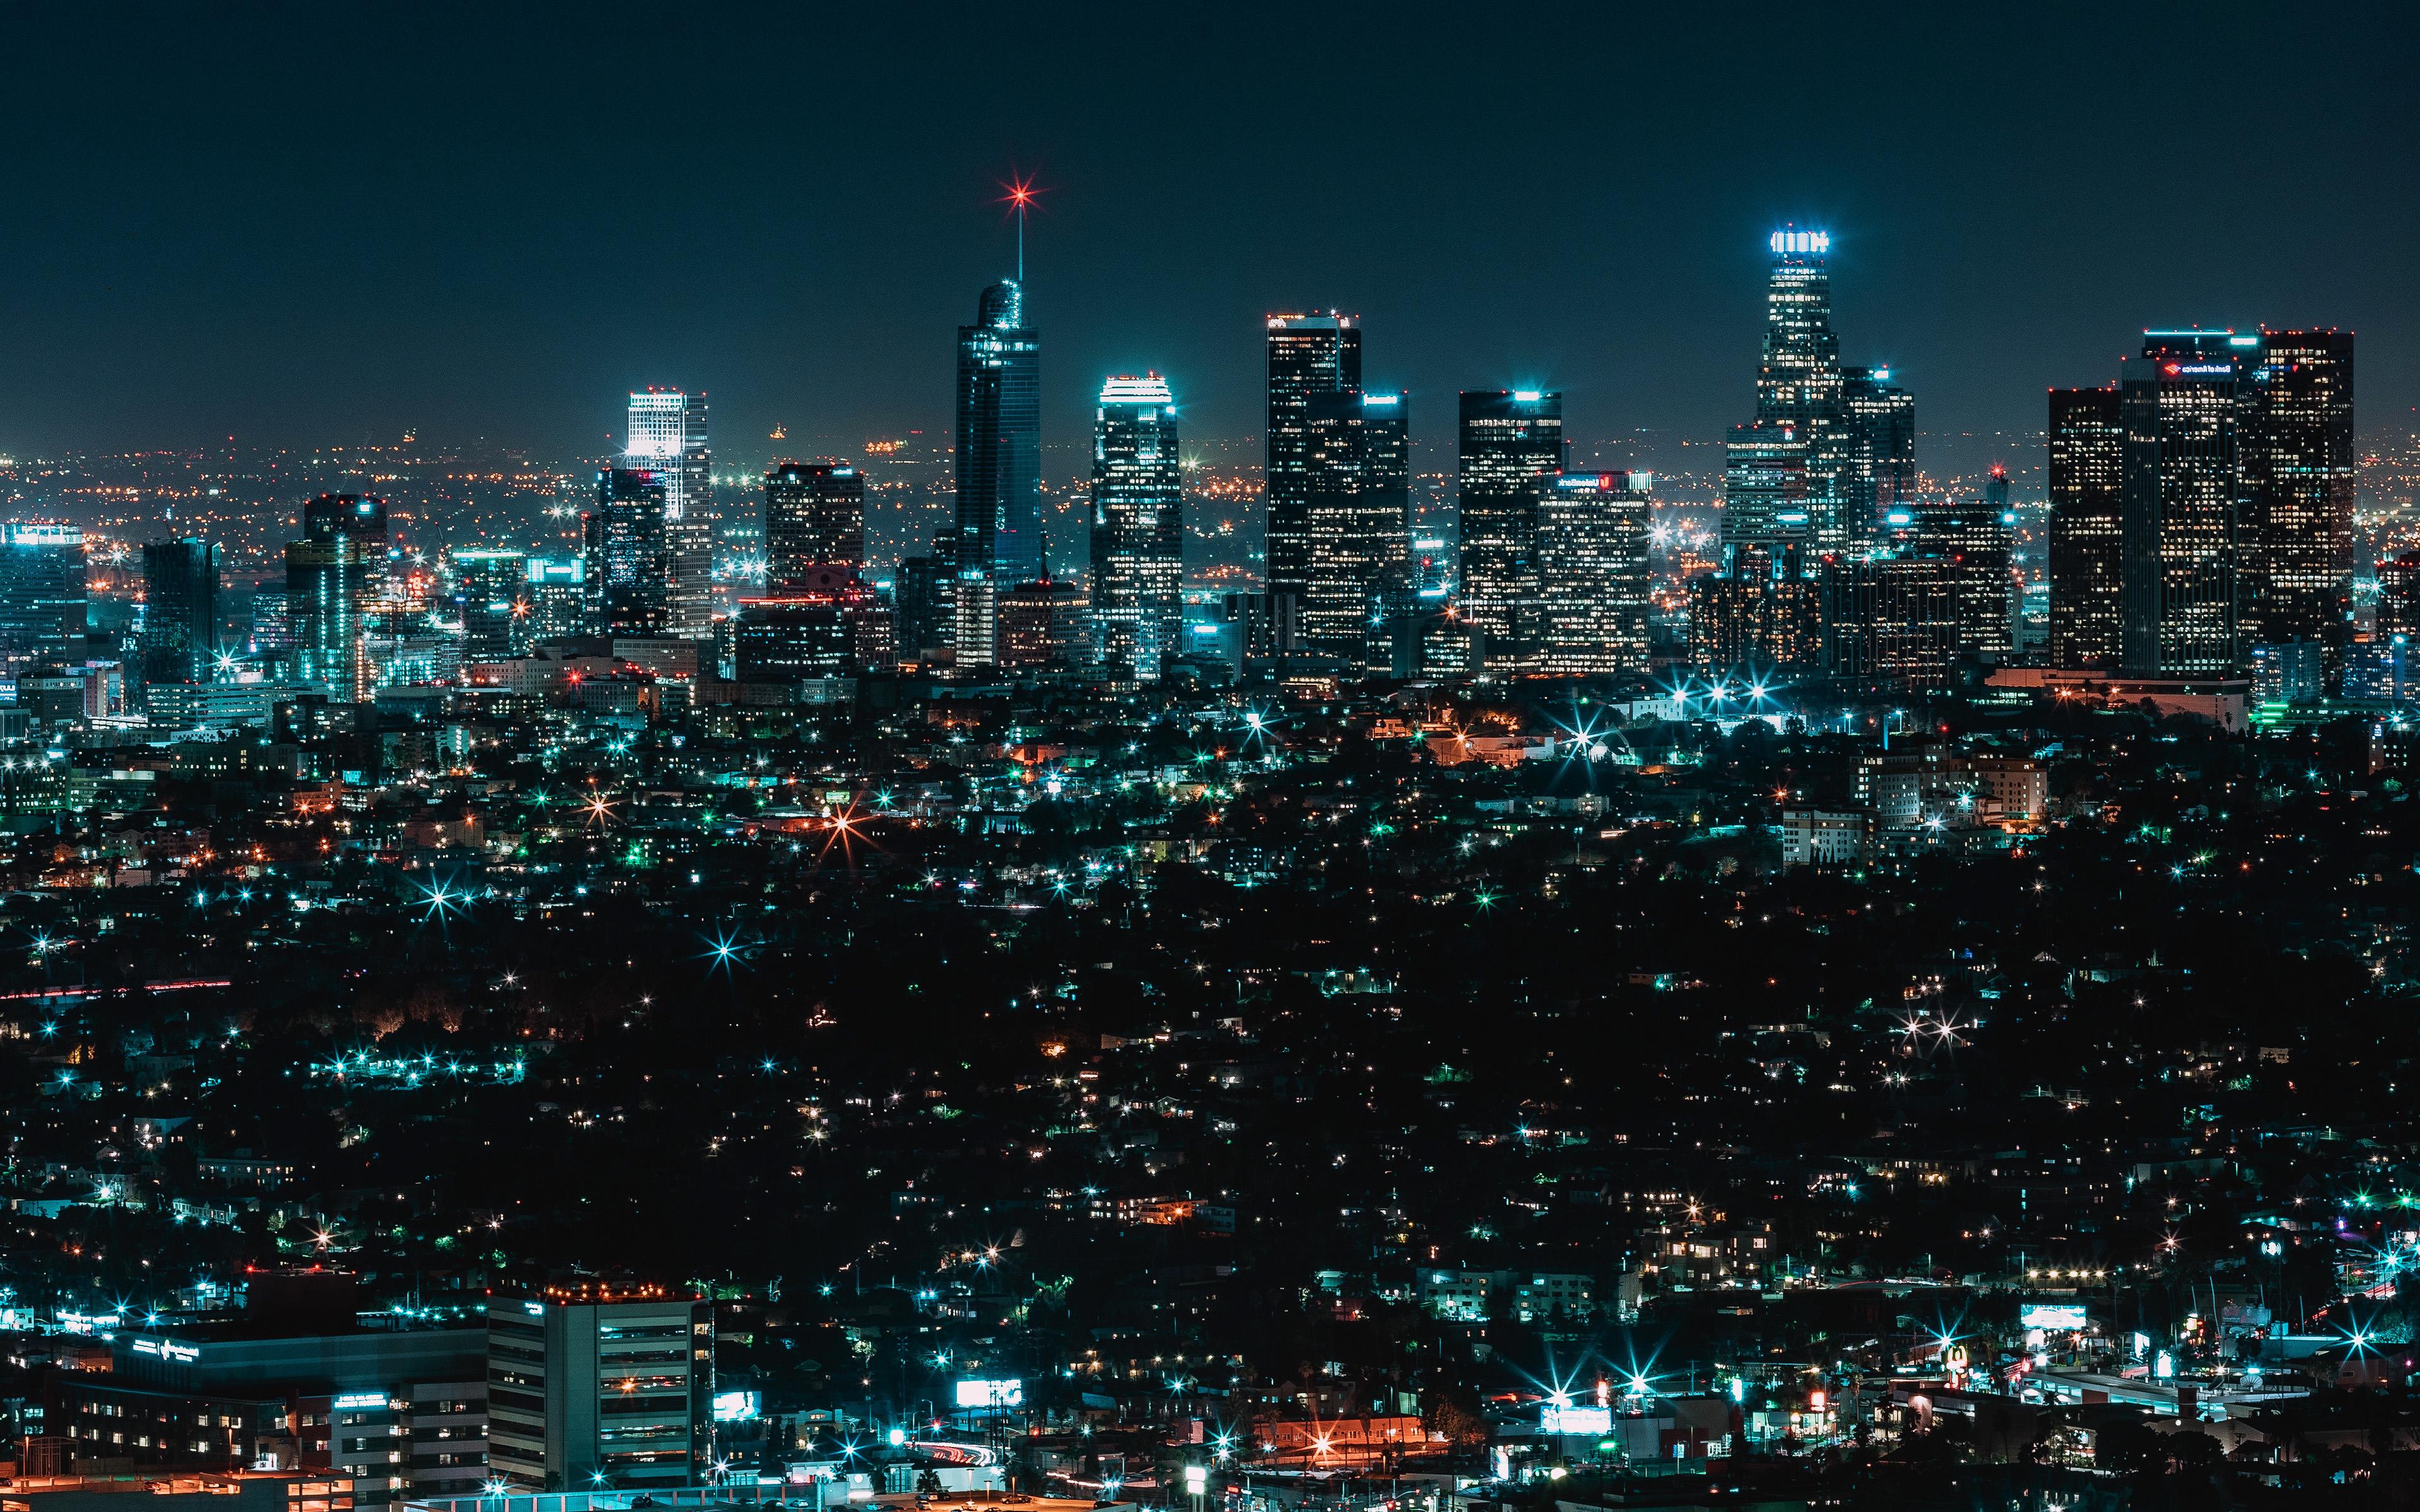 No13 City View Night Architecture Building Dark Newyork Wallpaper